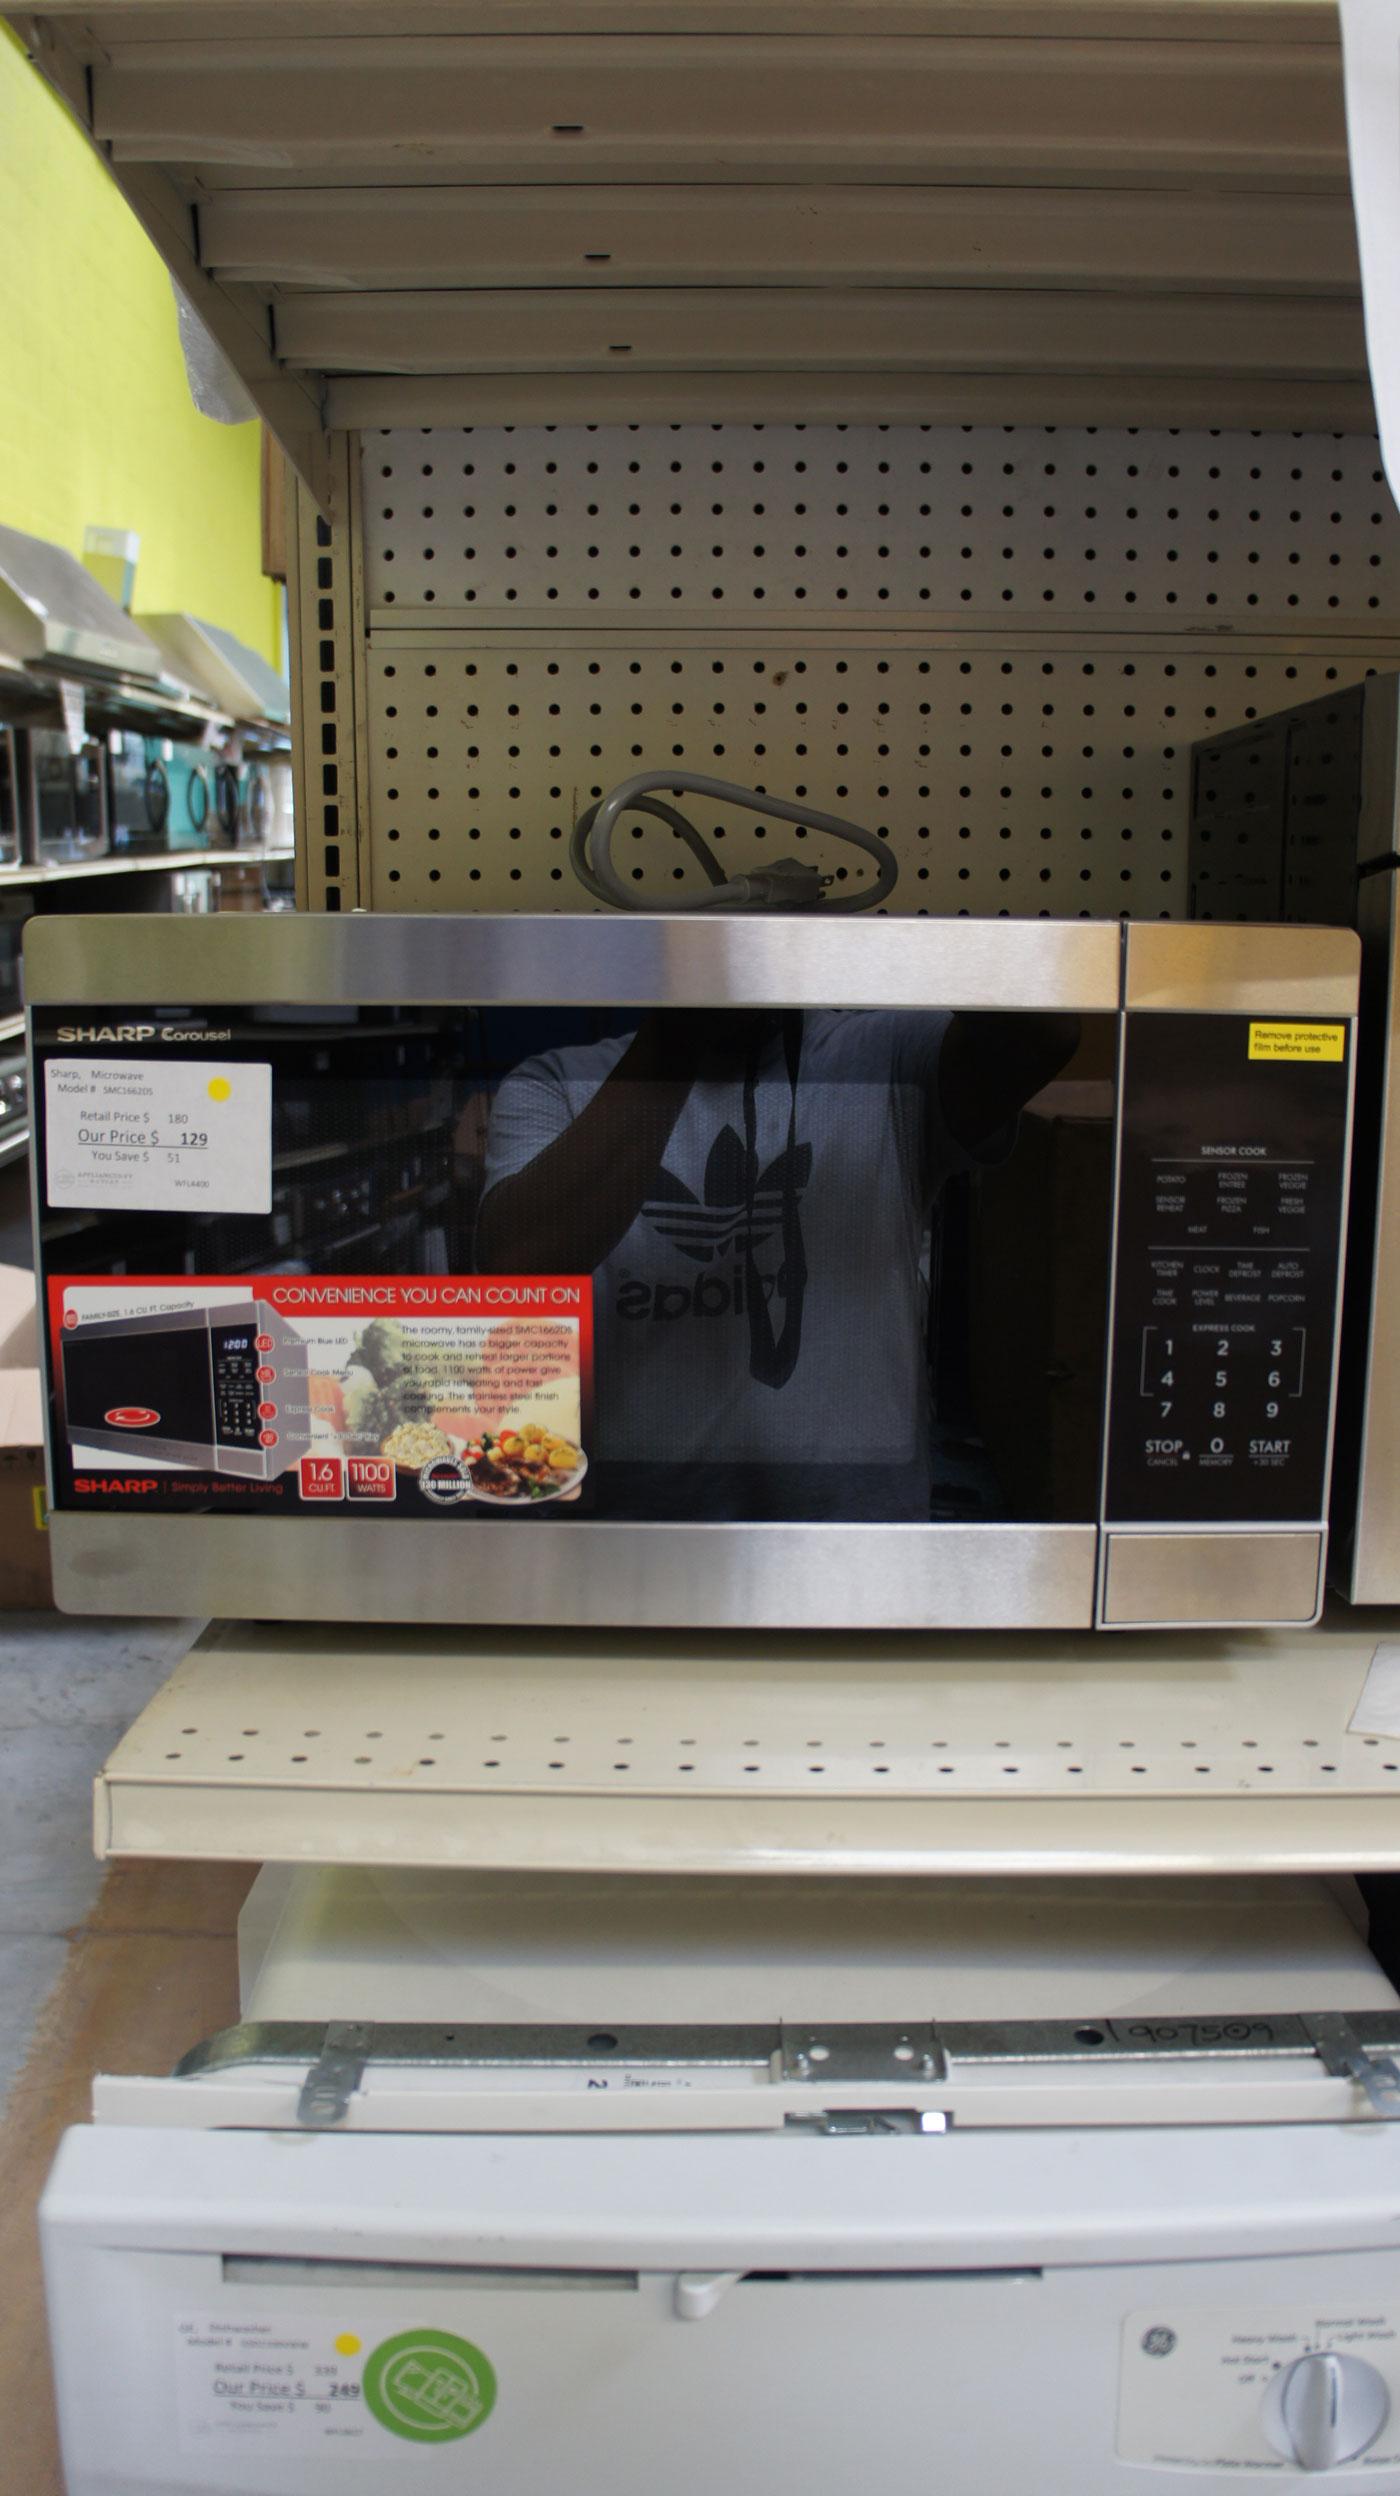 1.6 cu.ft. Sharp SMC1662DS 1100W Countertop Microwave Oven